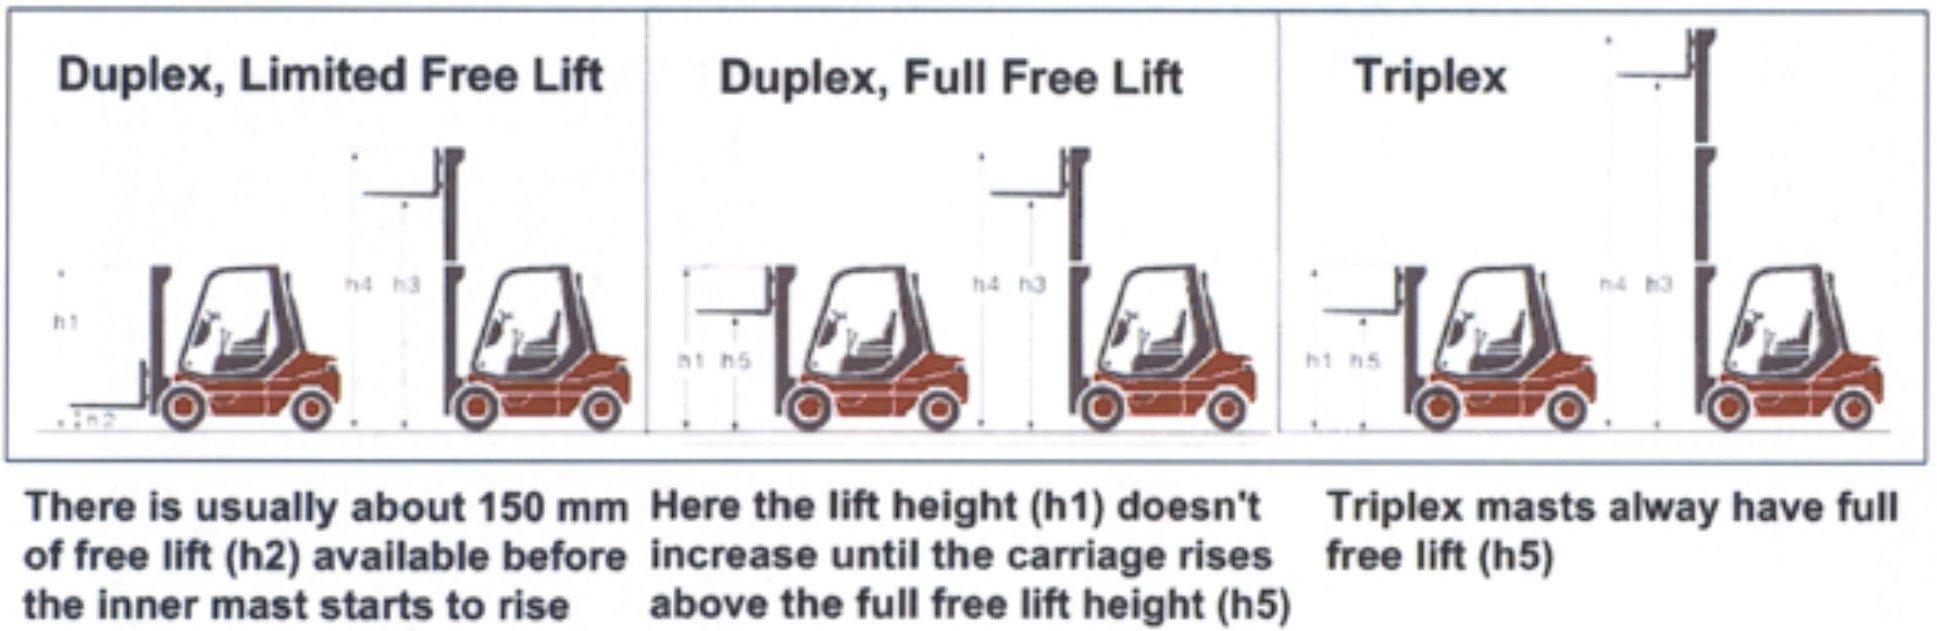 Mast-FreeLift-Guide-1